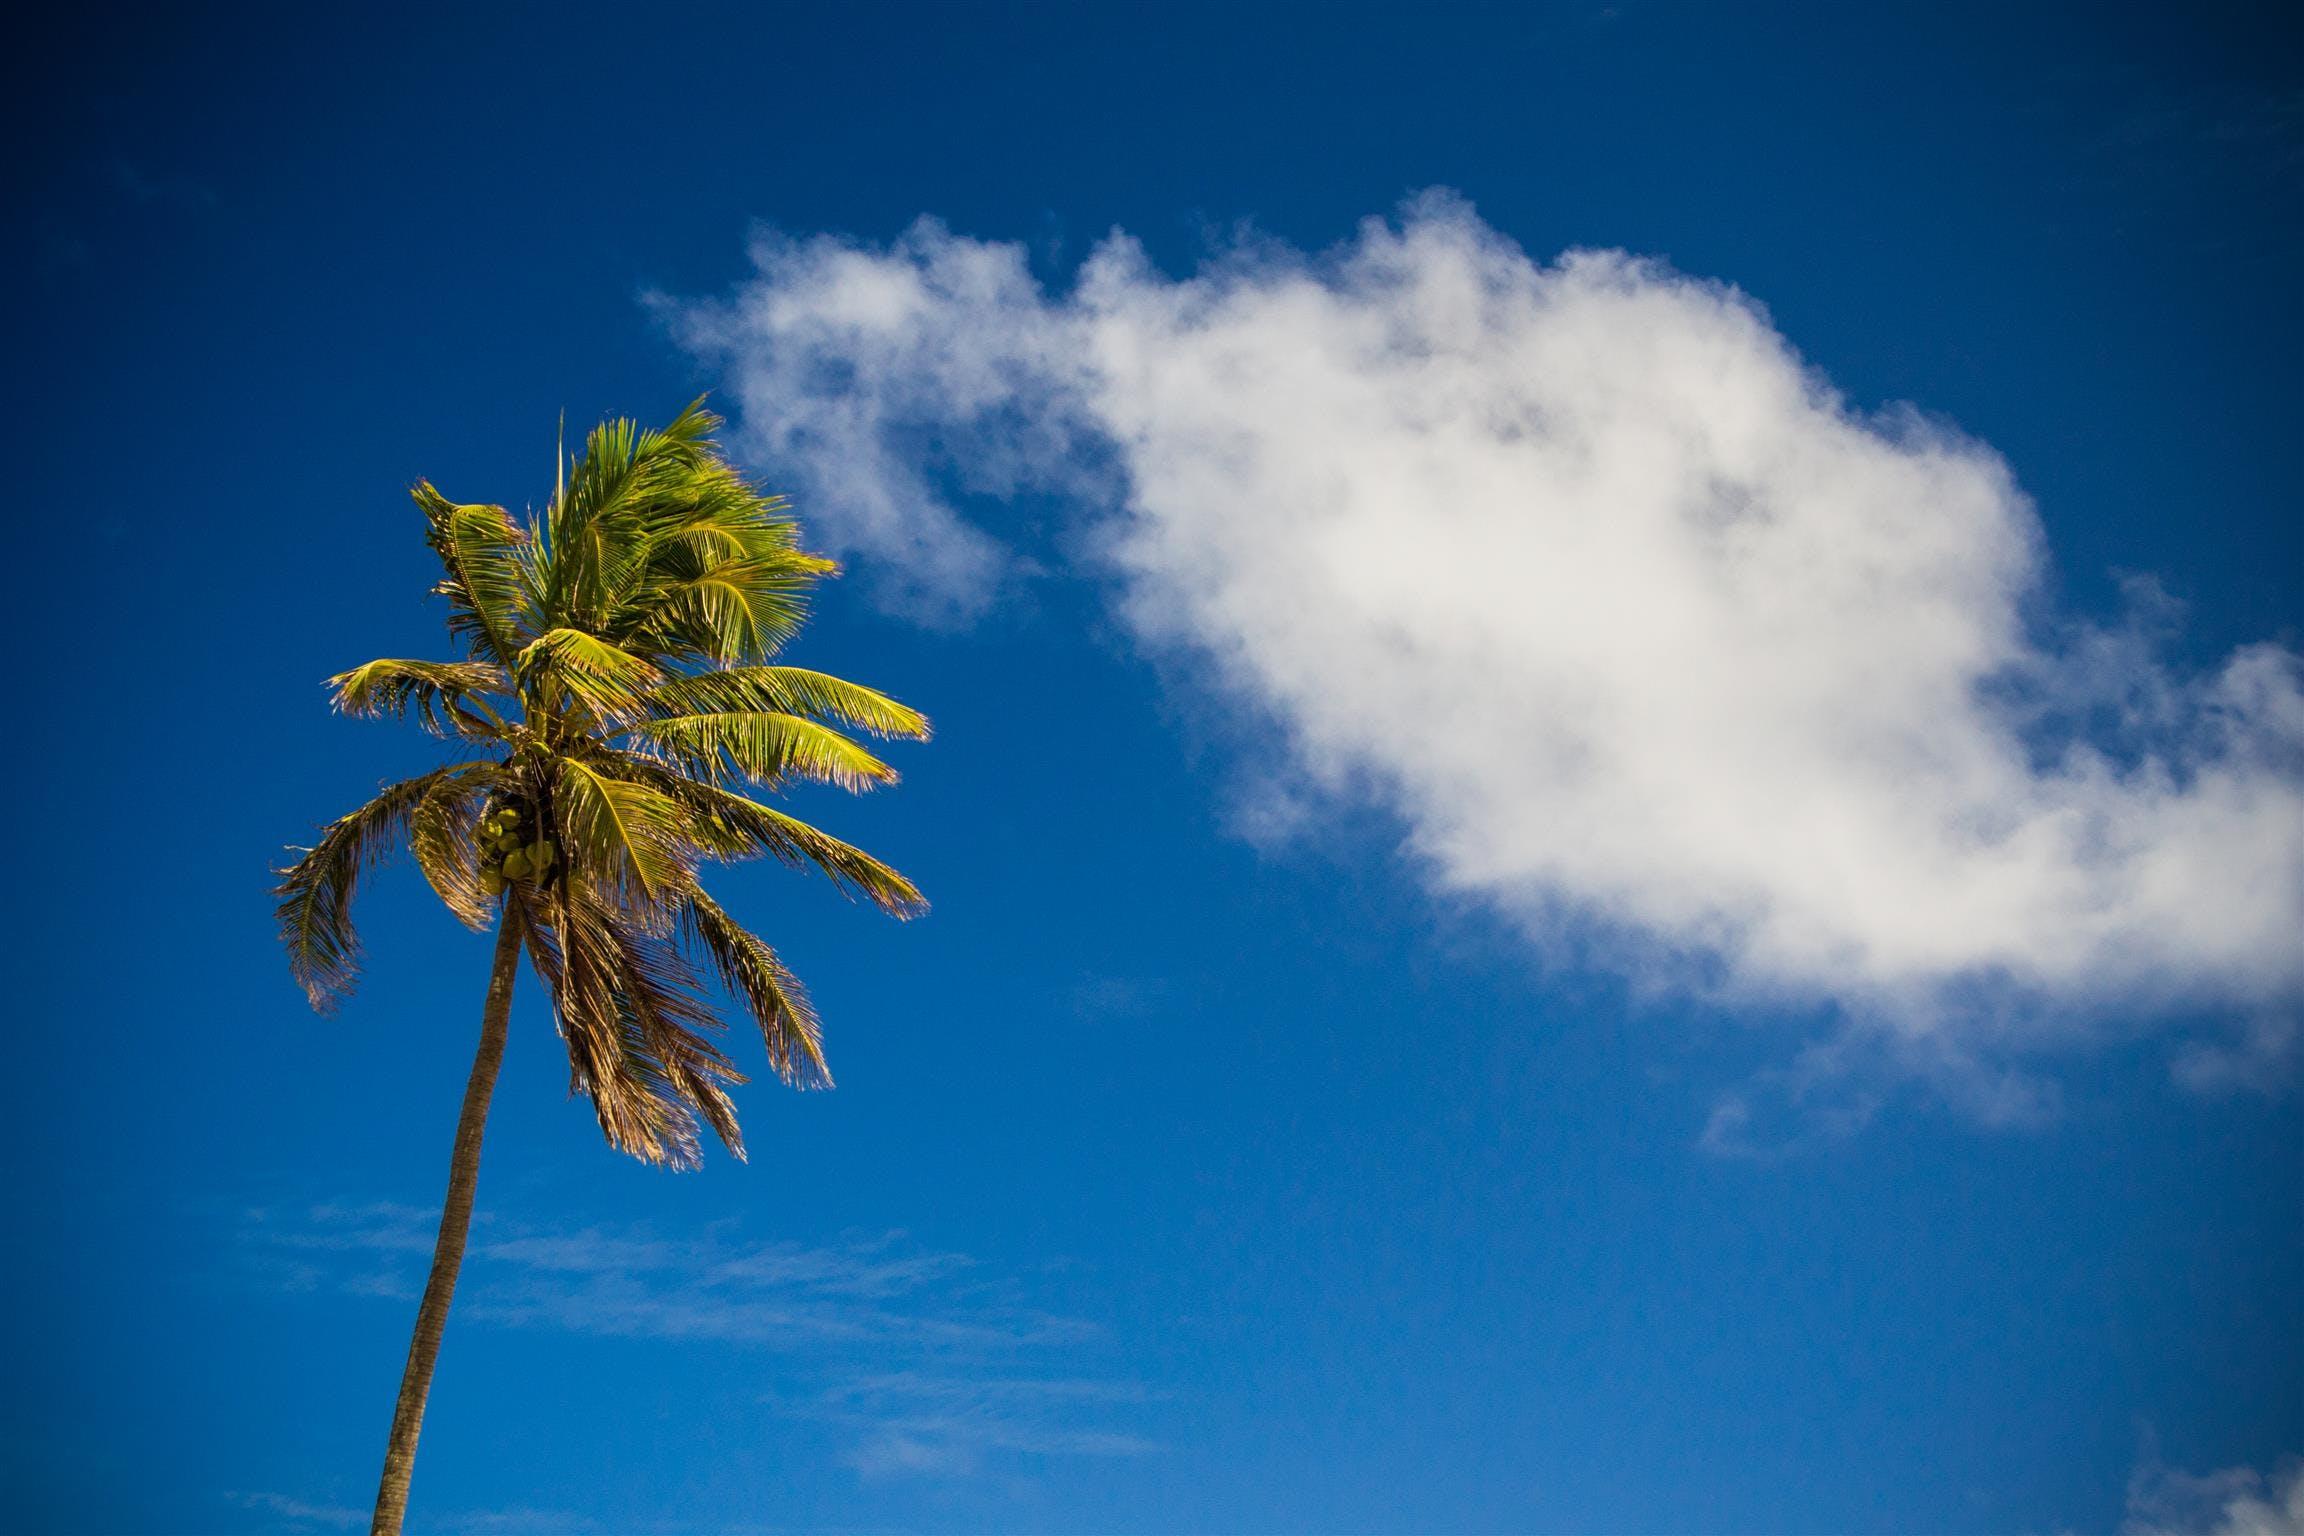 Palm Tree Under Cloudy Sky